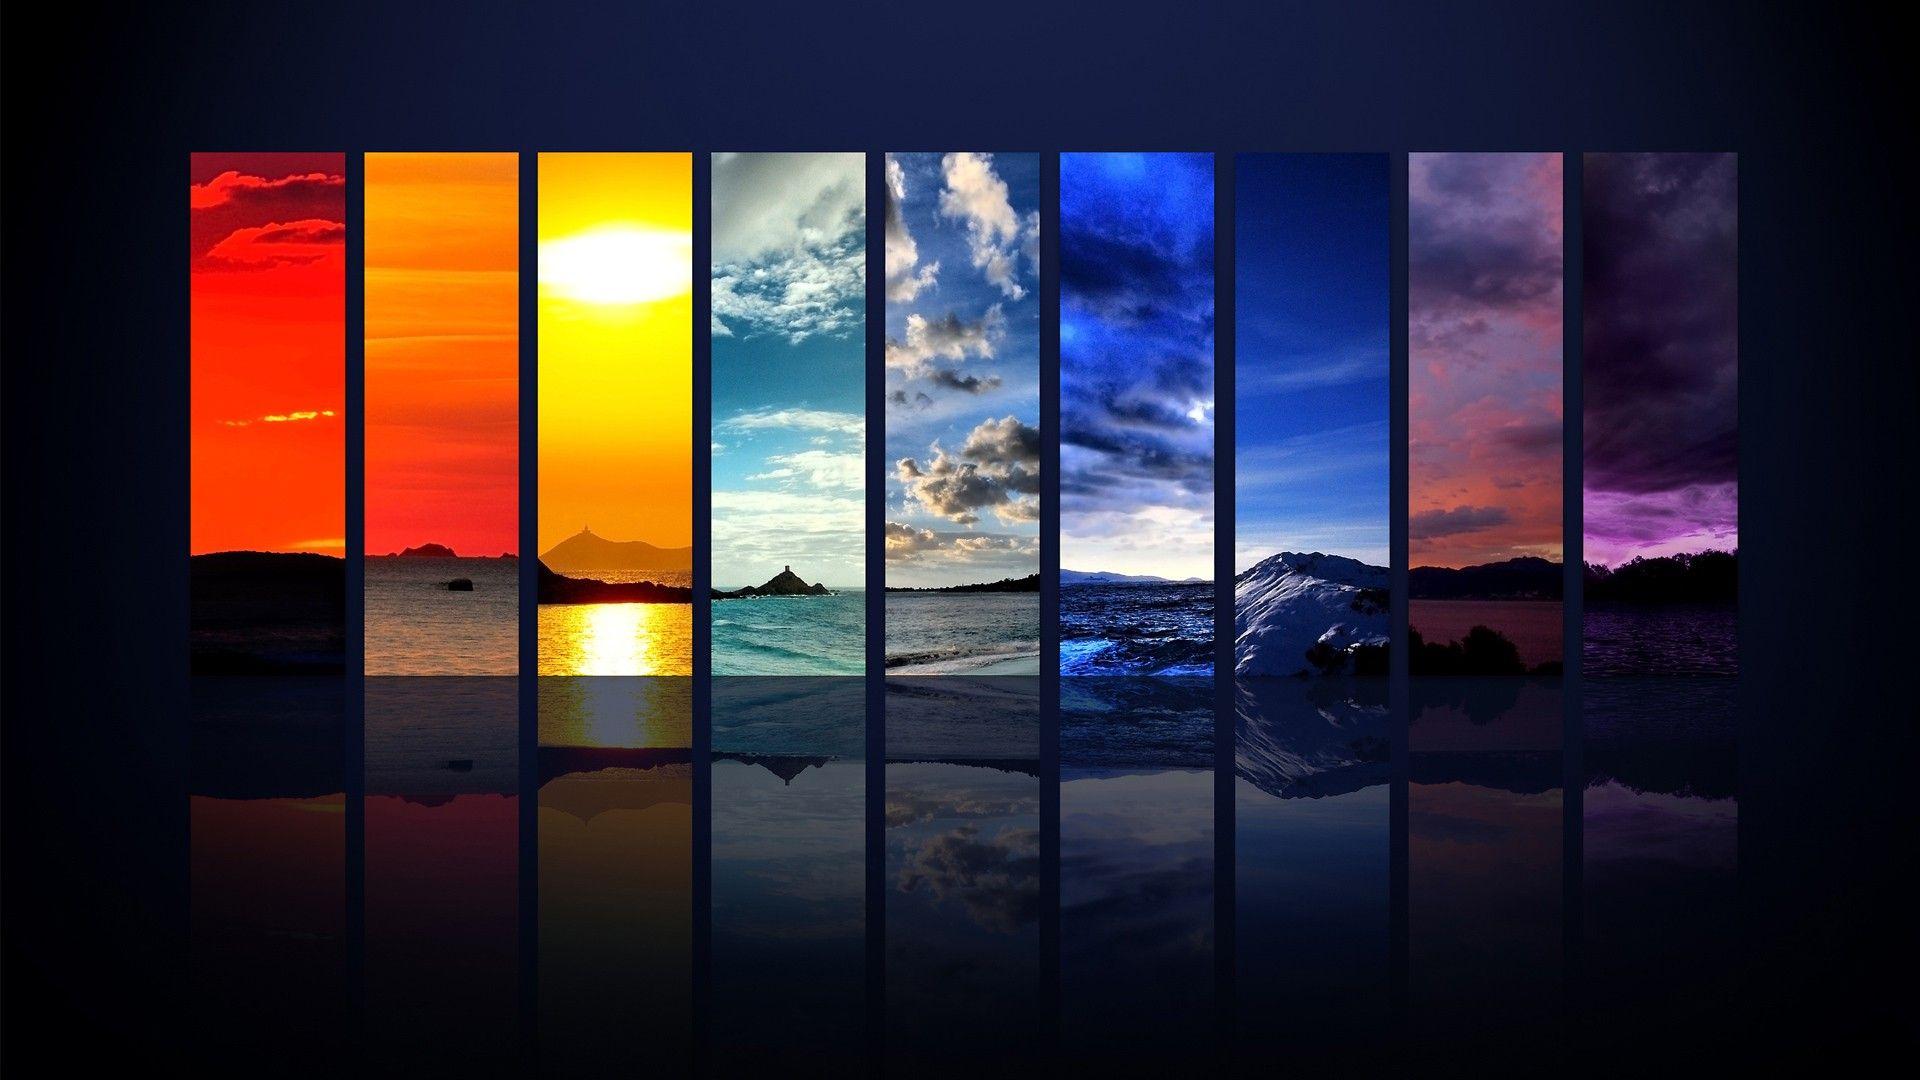 cool wallpapers for desktop best wallpaper hd